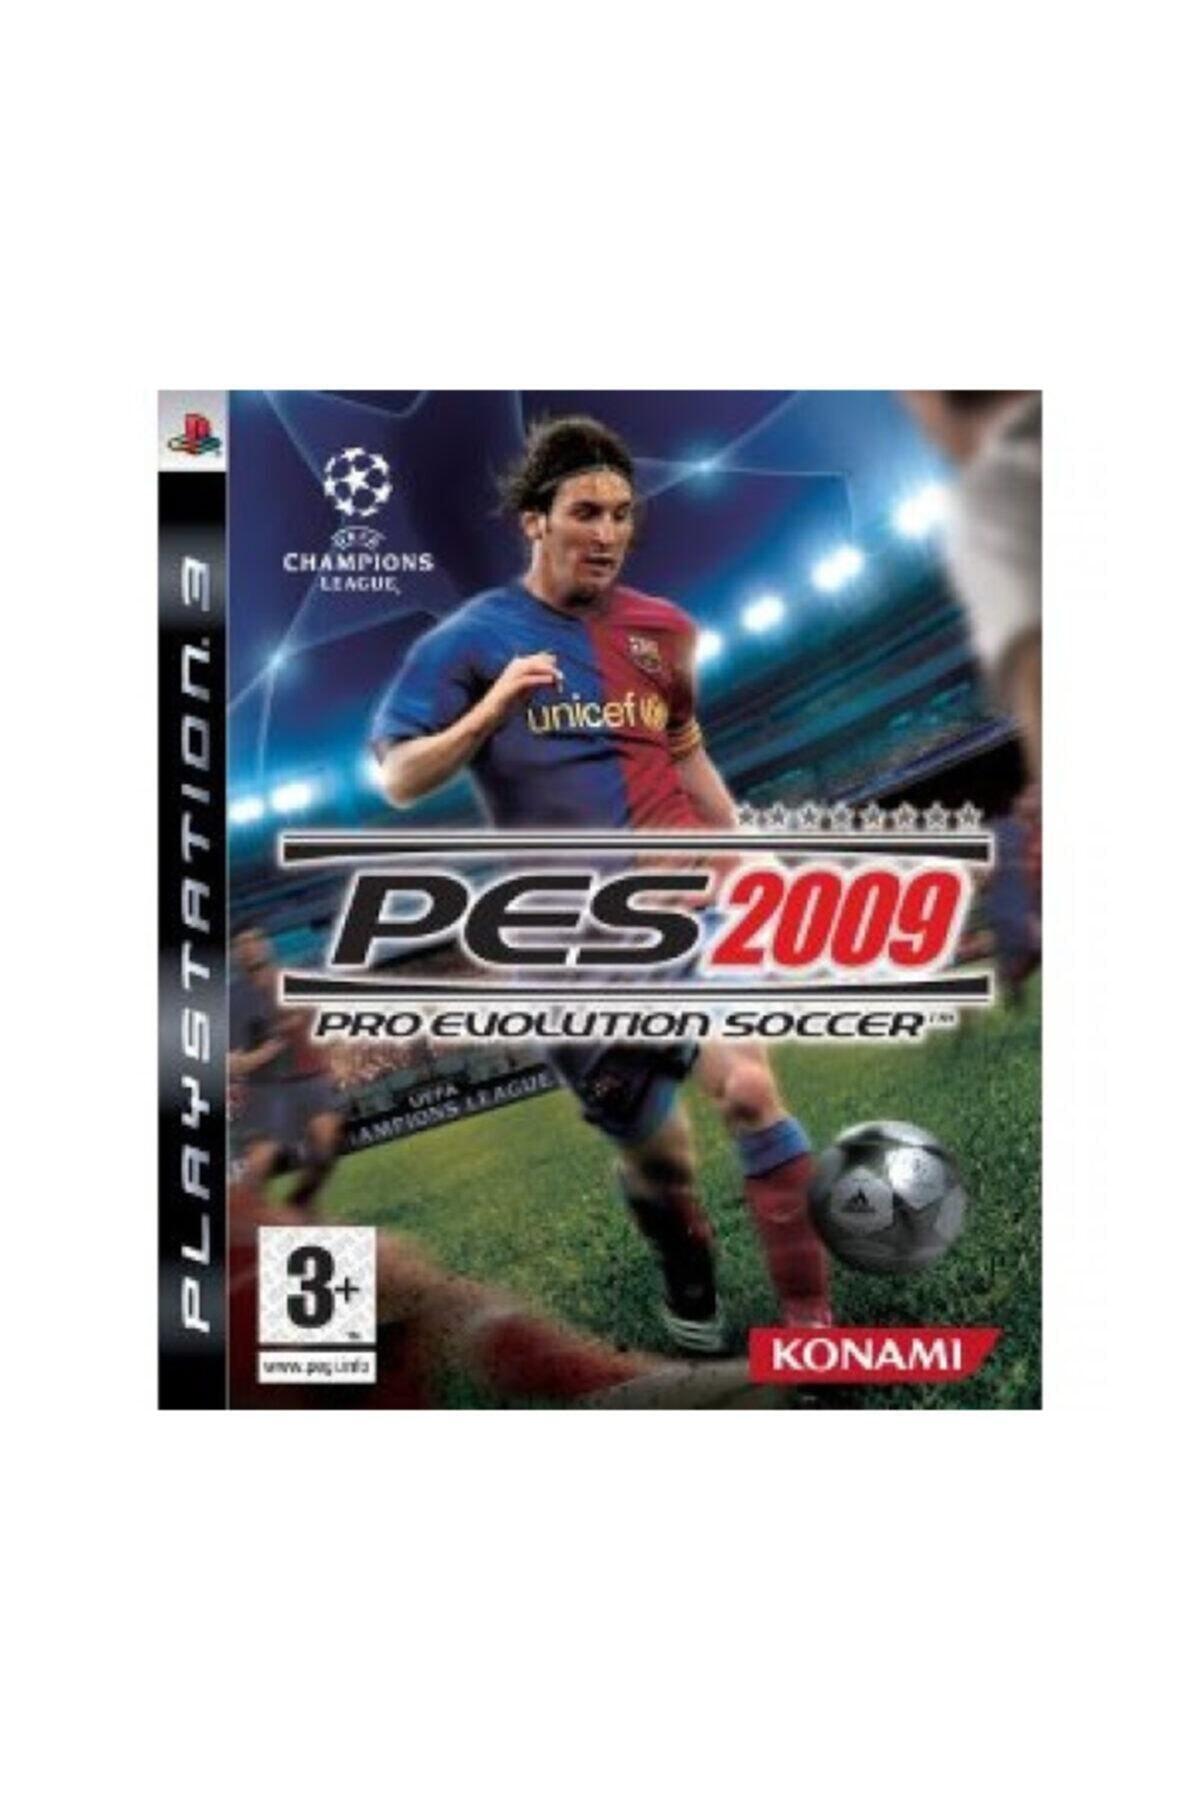 KONAMI Pro Evolution Soccer 2009 - Pes 2009 Ps3 1